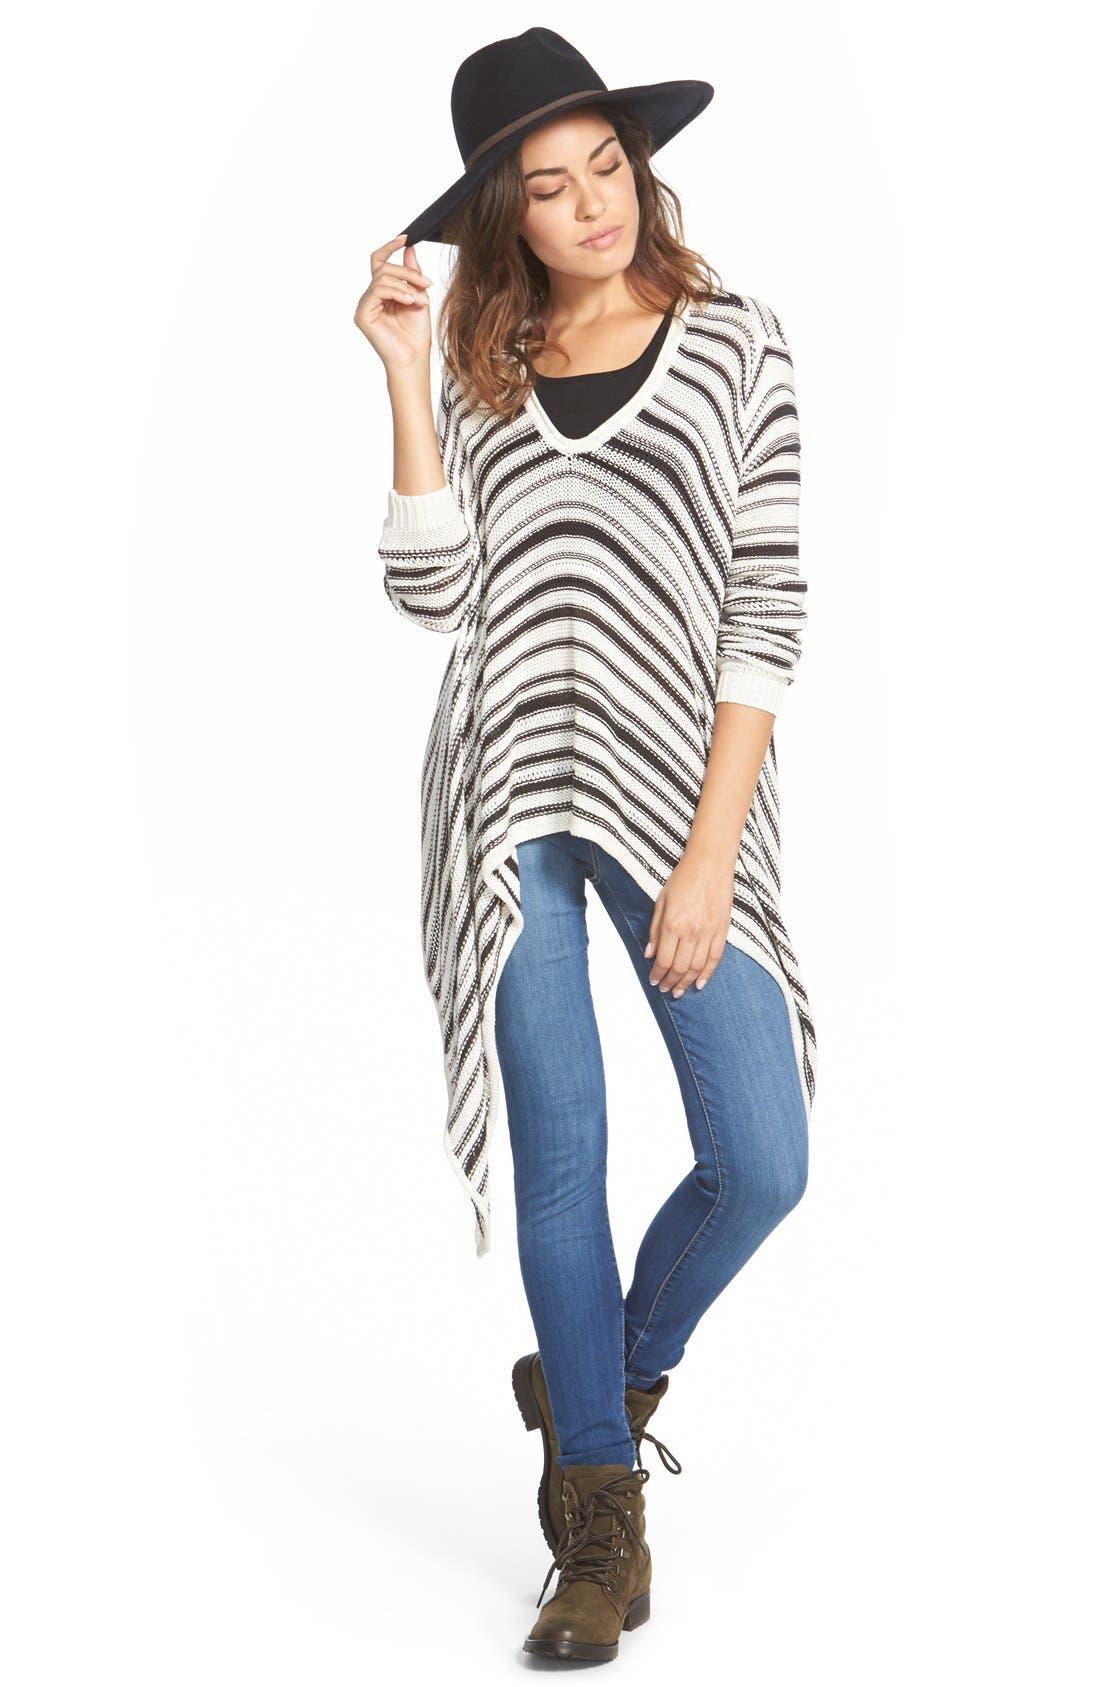 Alternate Image 1 Selected - Billabong 'Love Lock' Stripe Cotton Sweater